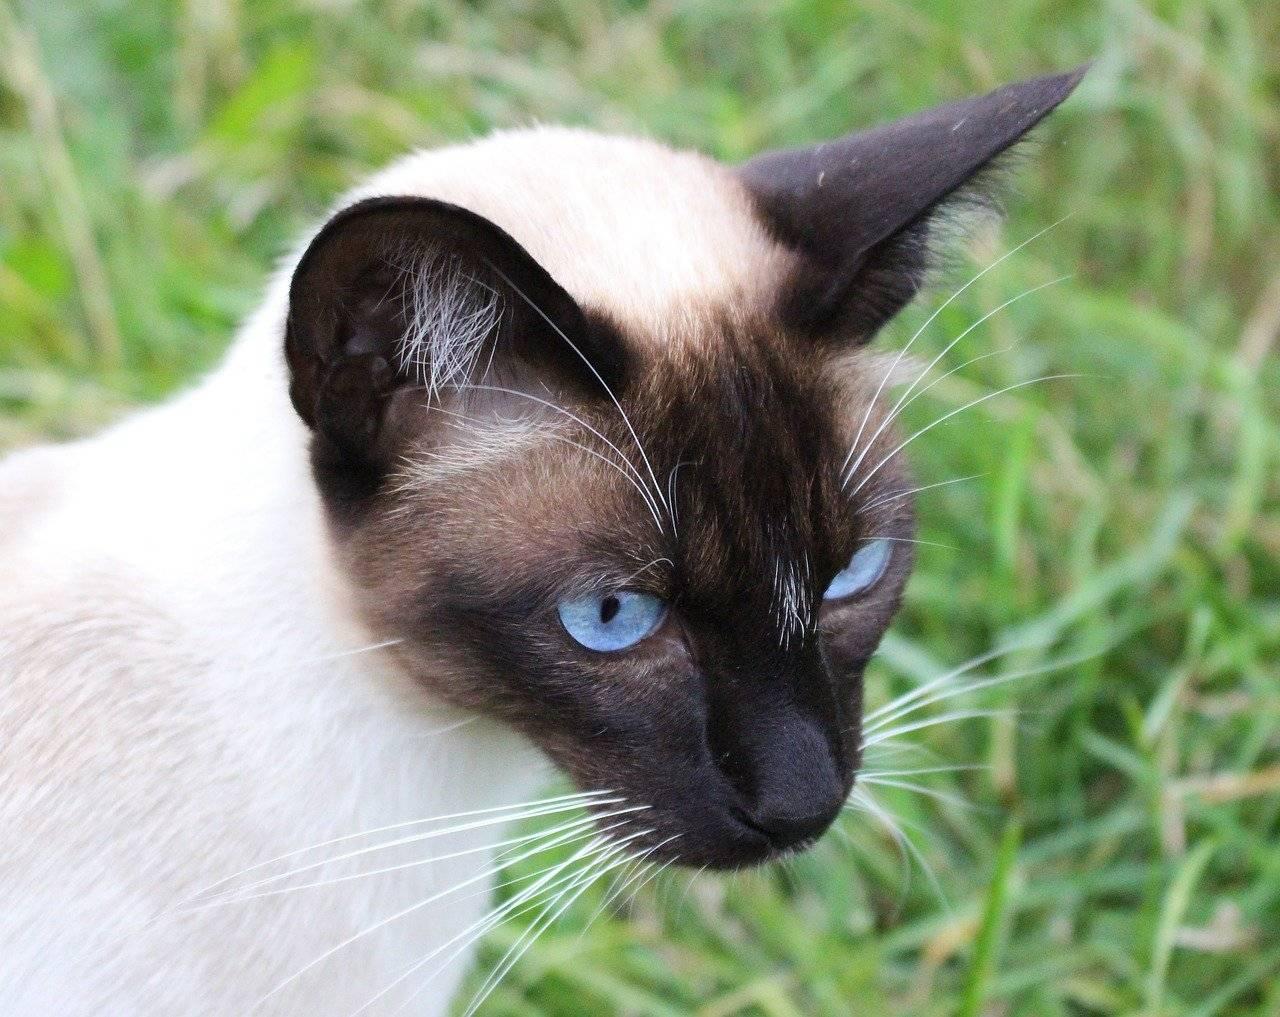 Гималайская кошка: 20 фото, описание внешнего вида и характера, цена котенка